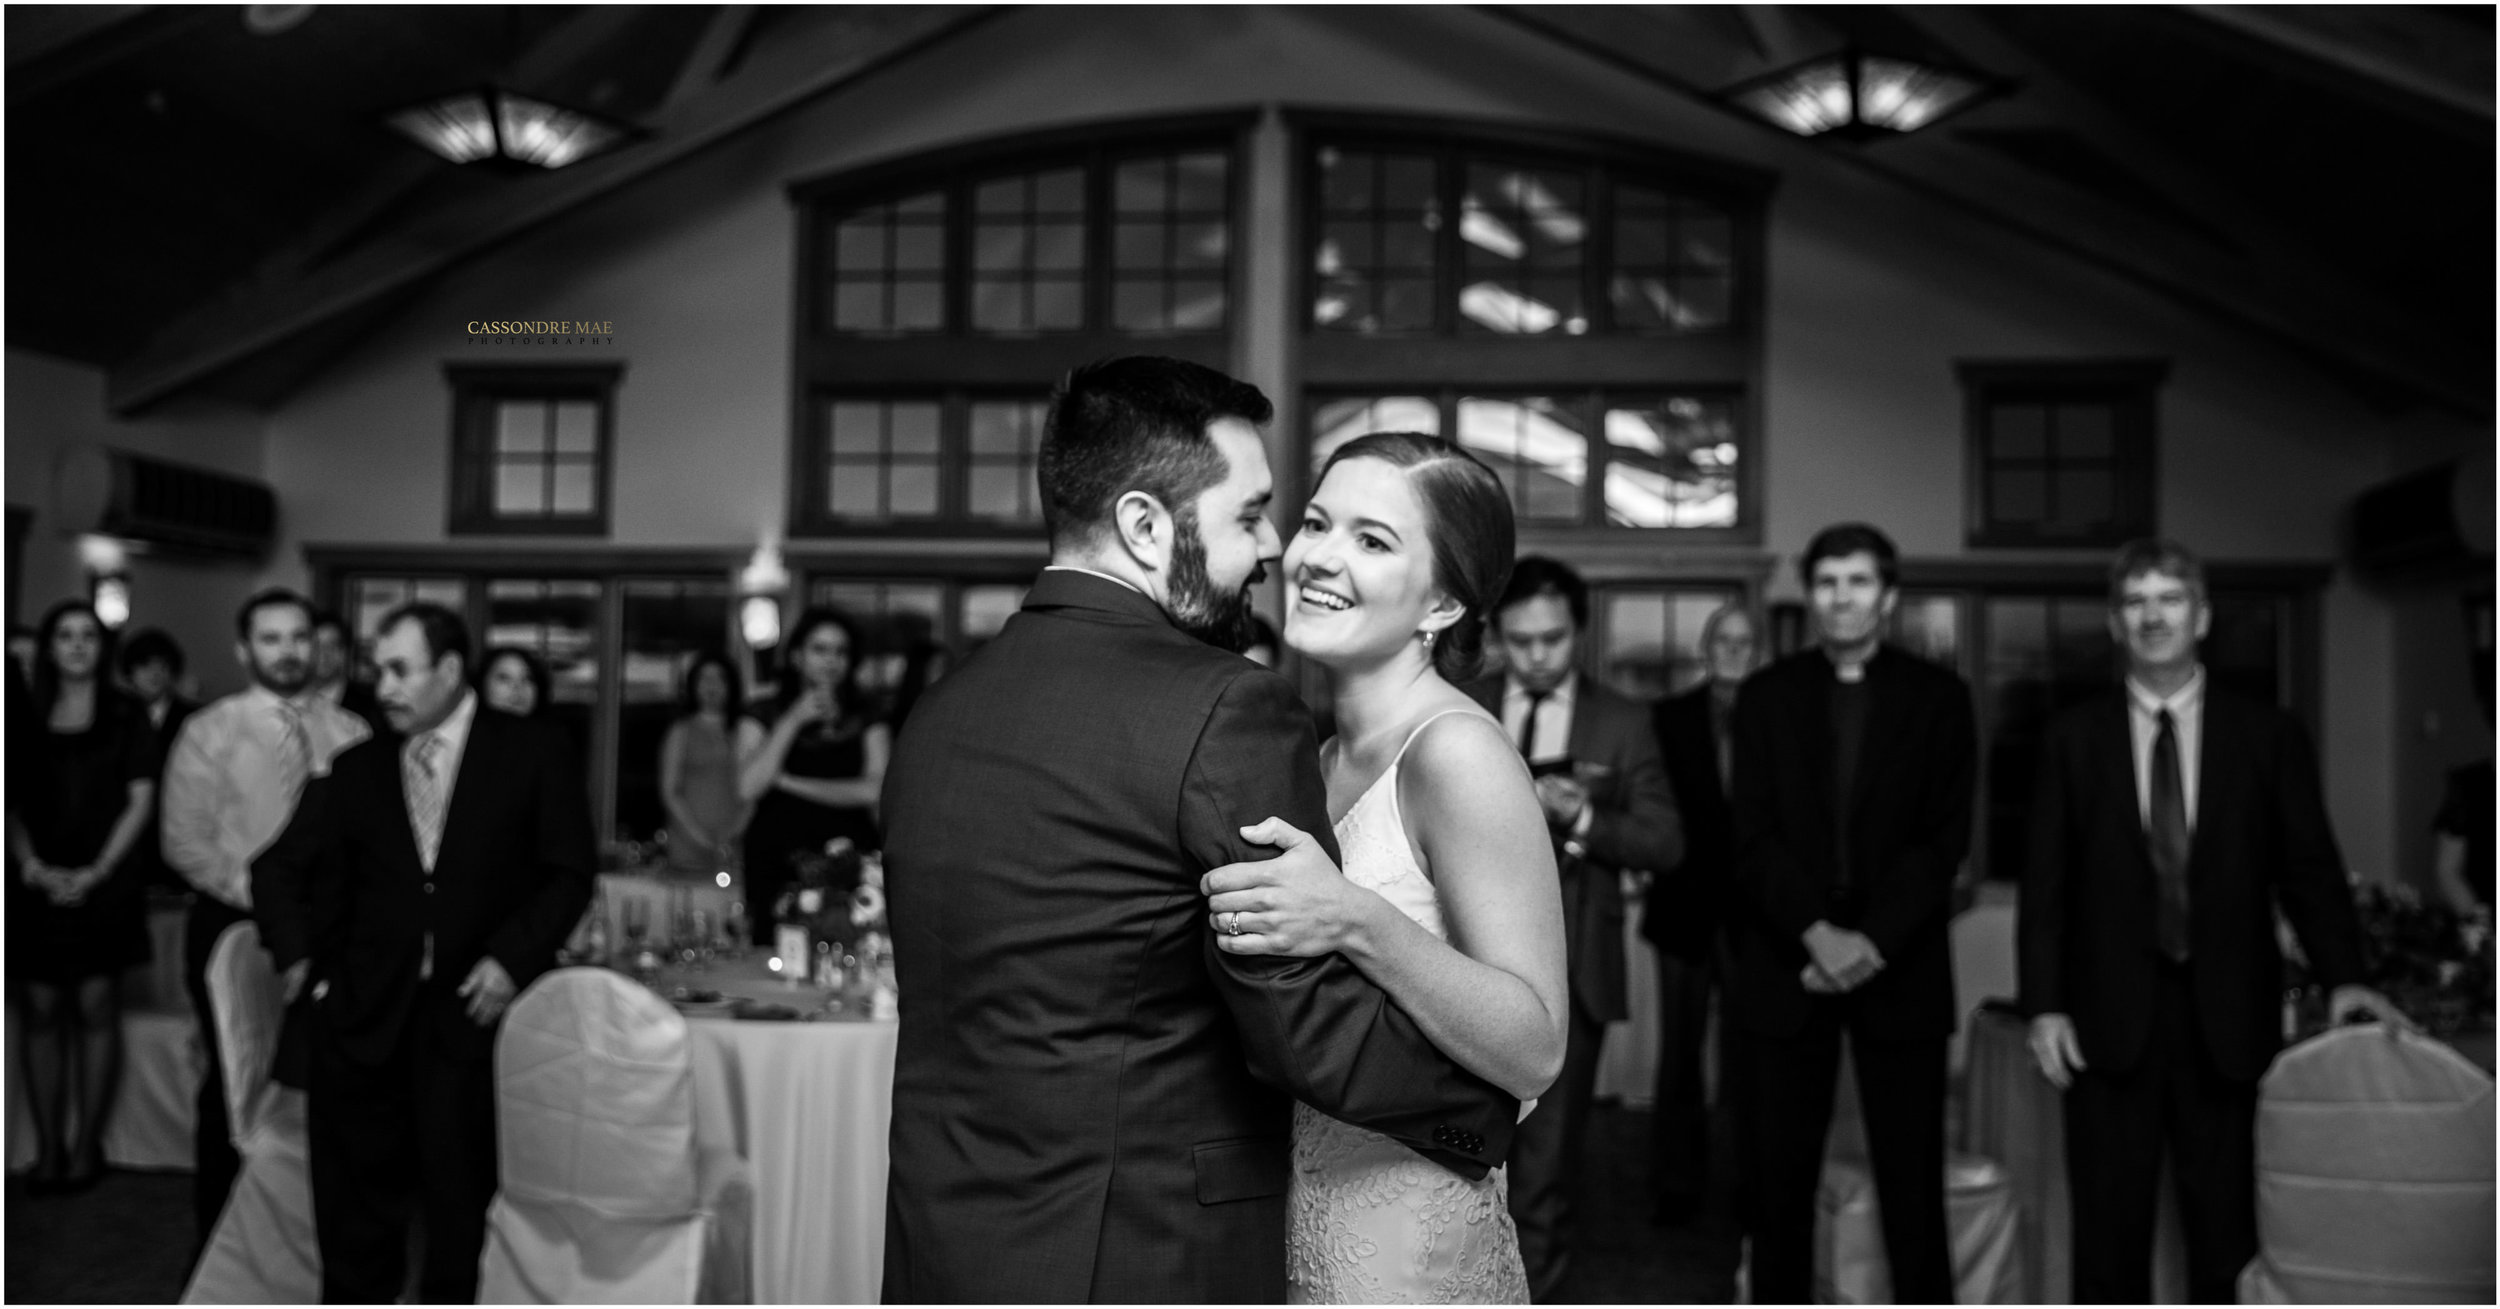 Cassondre Mae Photography Stony Ford Wedding 3.jpg